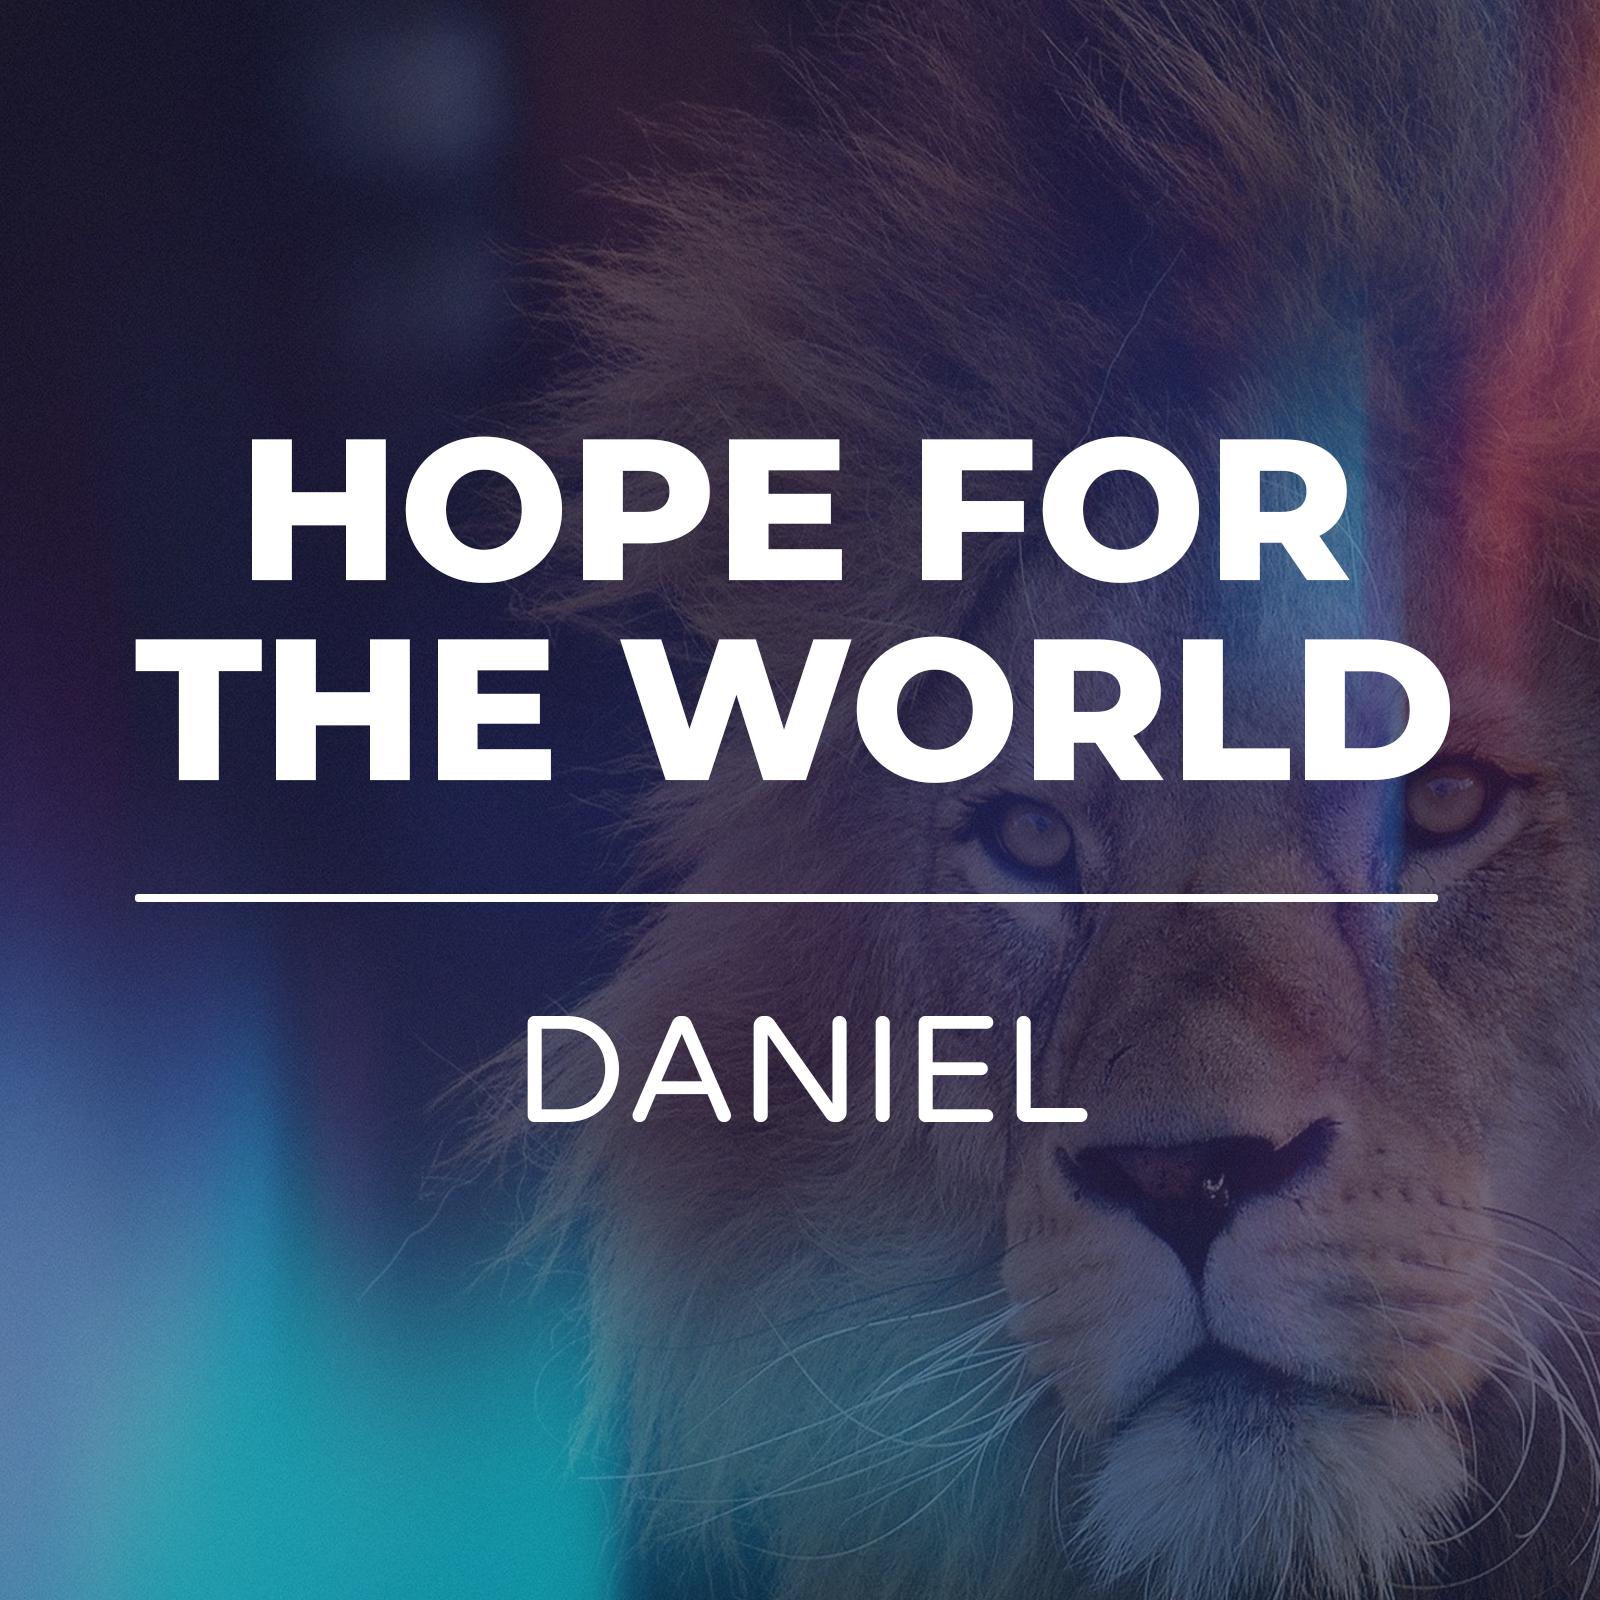 Hope for the world - Daniel sermon series - hope church huddersfield